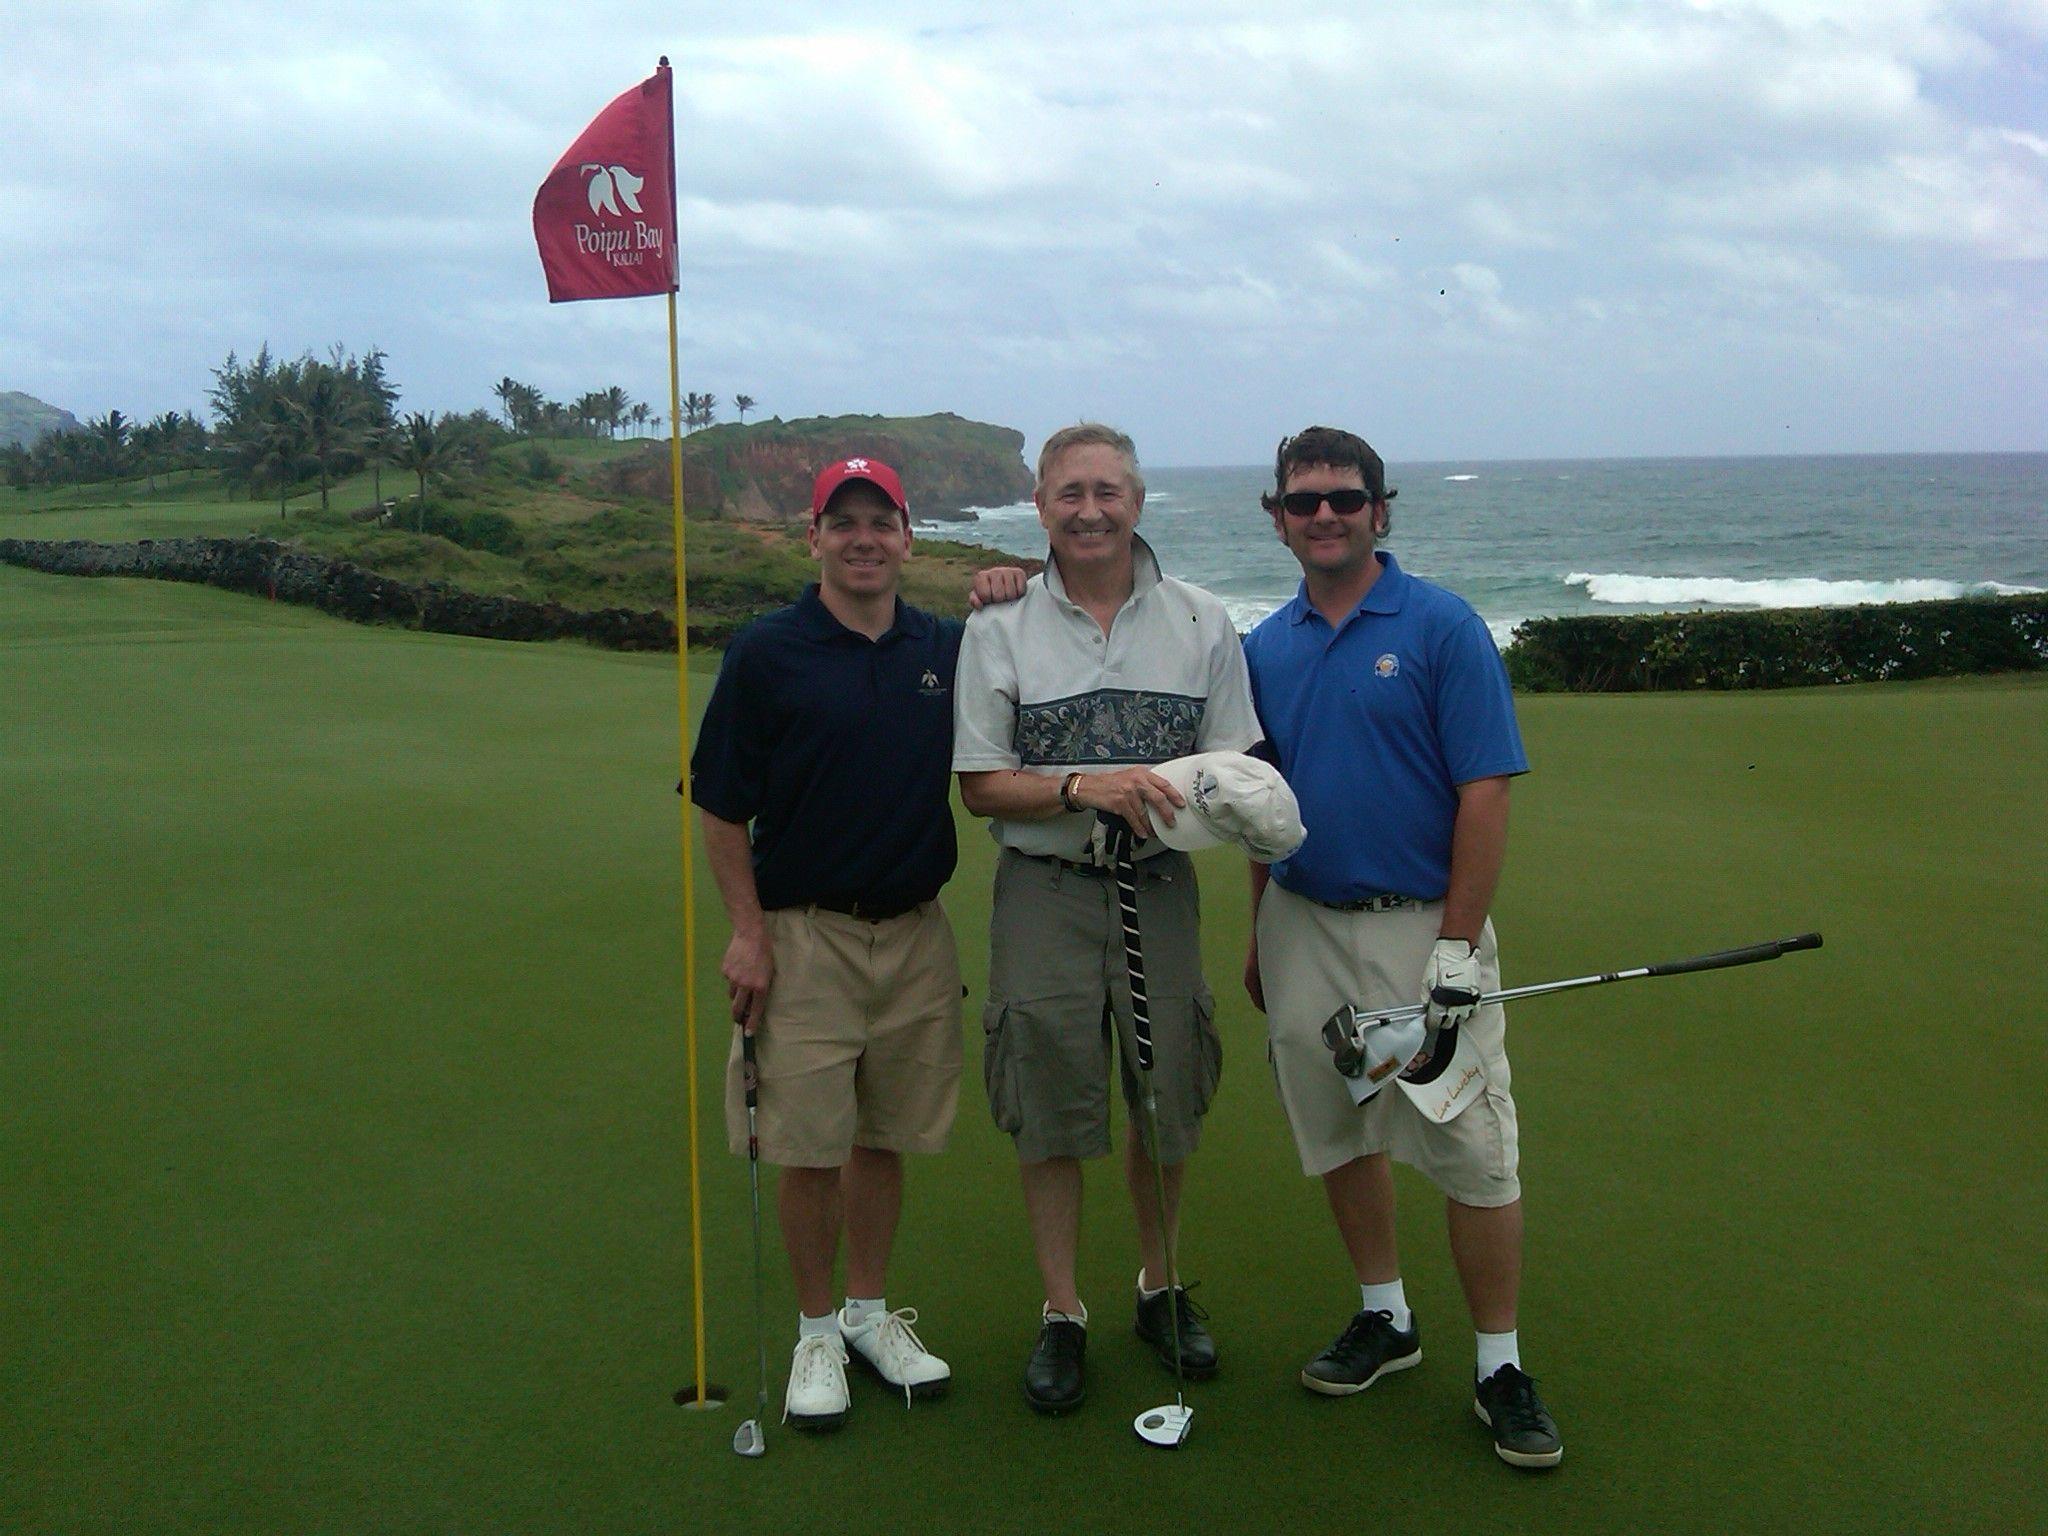 Bear Trap at PGA National Resort in Palm Beach Gardens, Florida ...